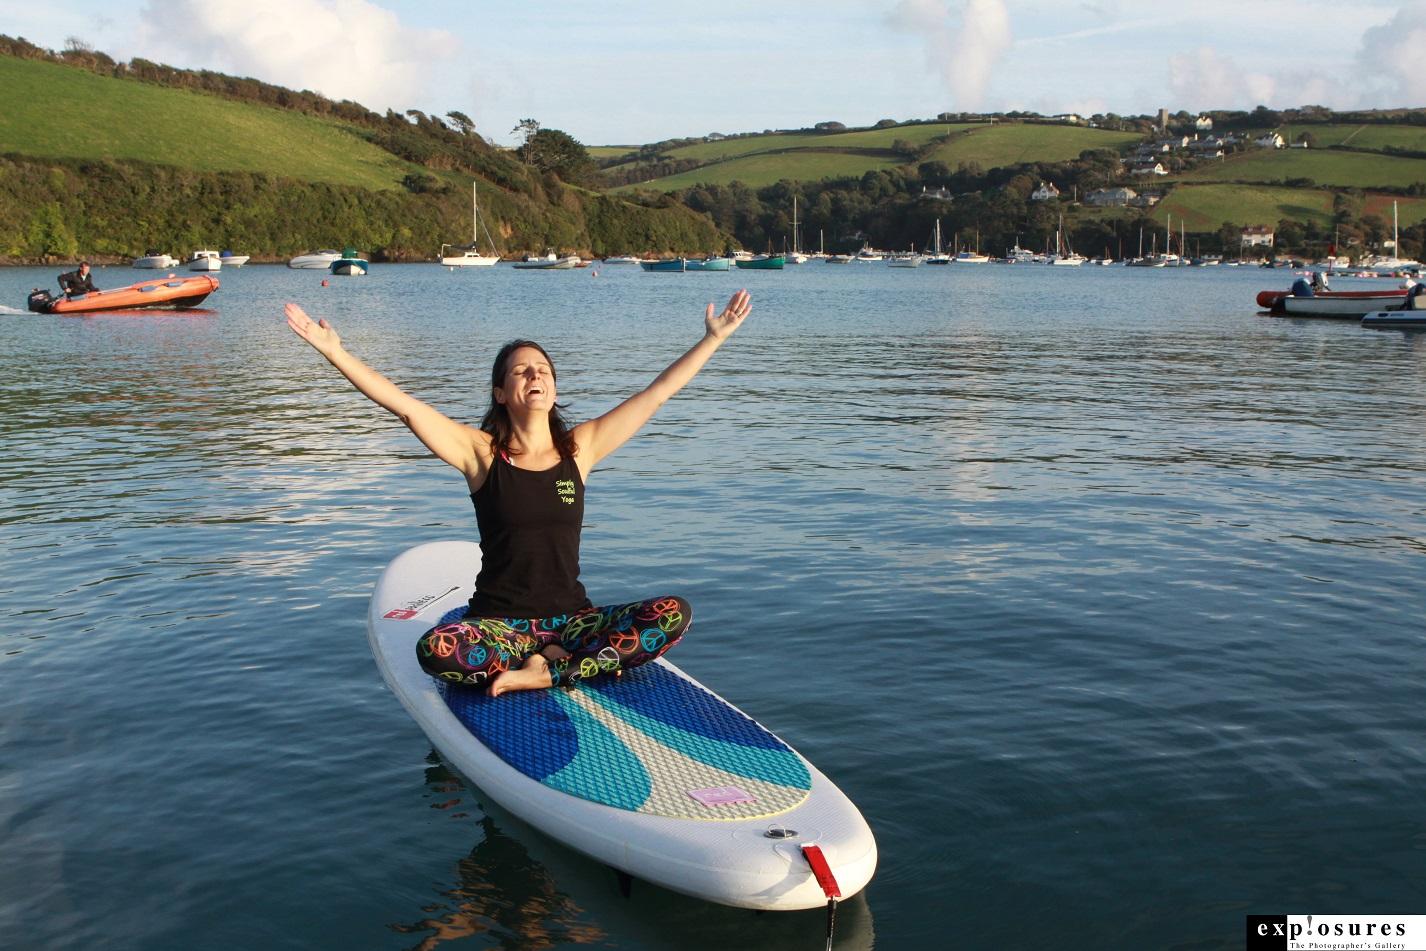 SUP Yoga Retreat - Sea, Beach and Scones on 14th September, 2019